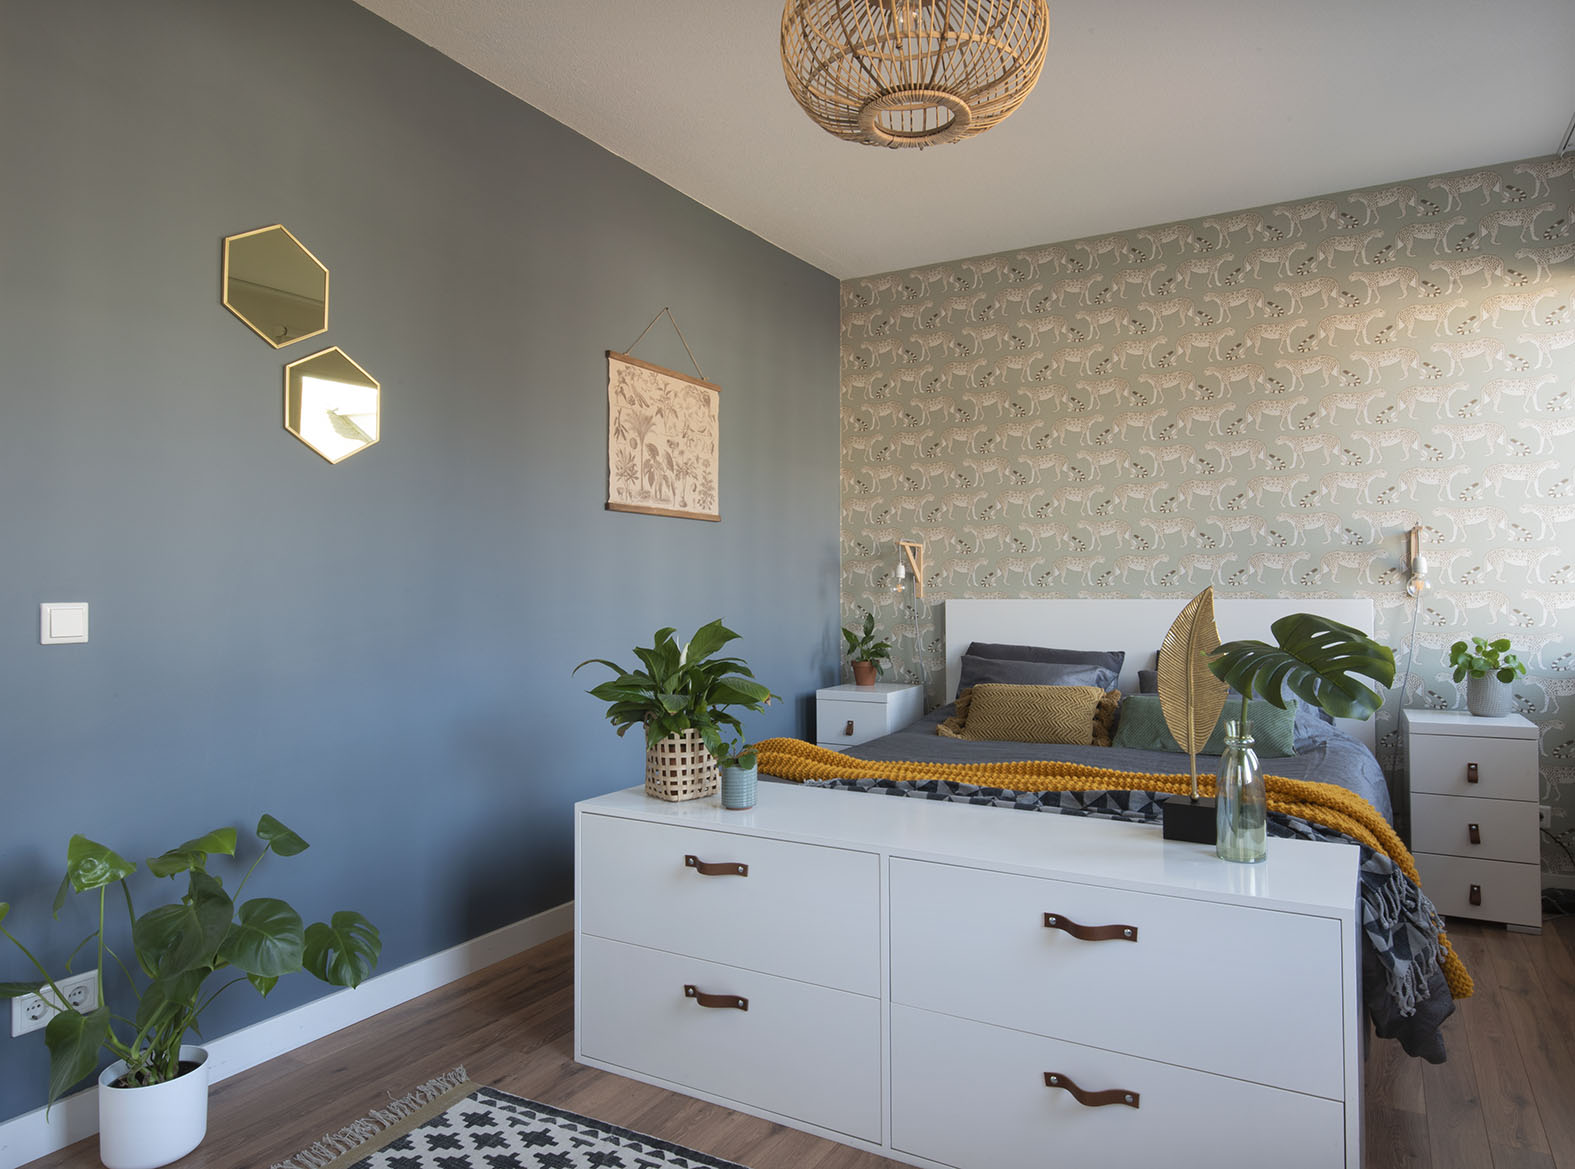 Slaapkamer-interieur-ontwerp-blauw-luipaard-styling-groen-3